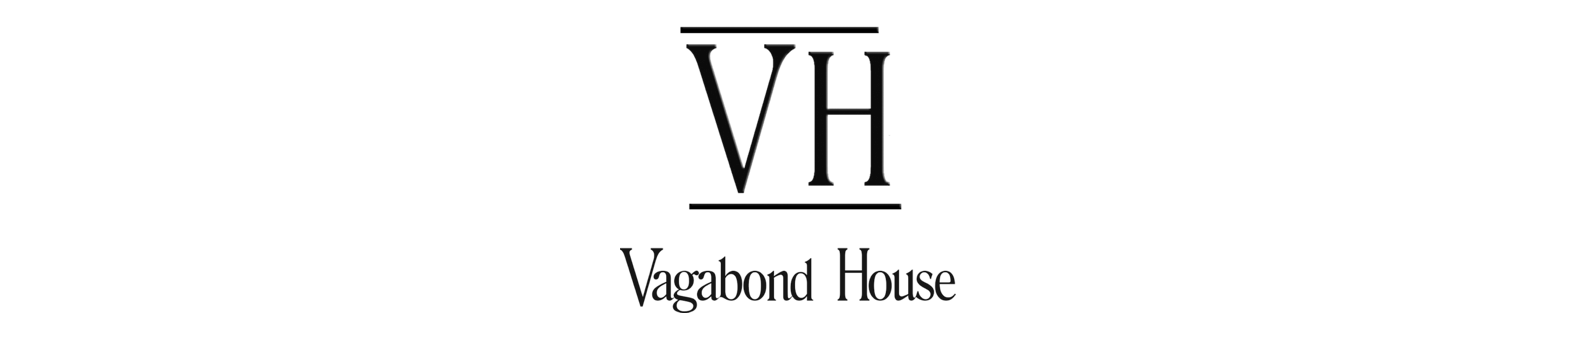 Vagabond House Logo